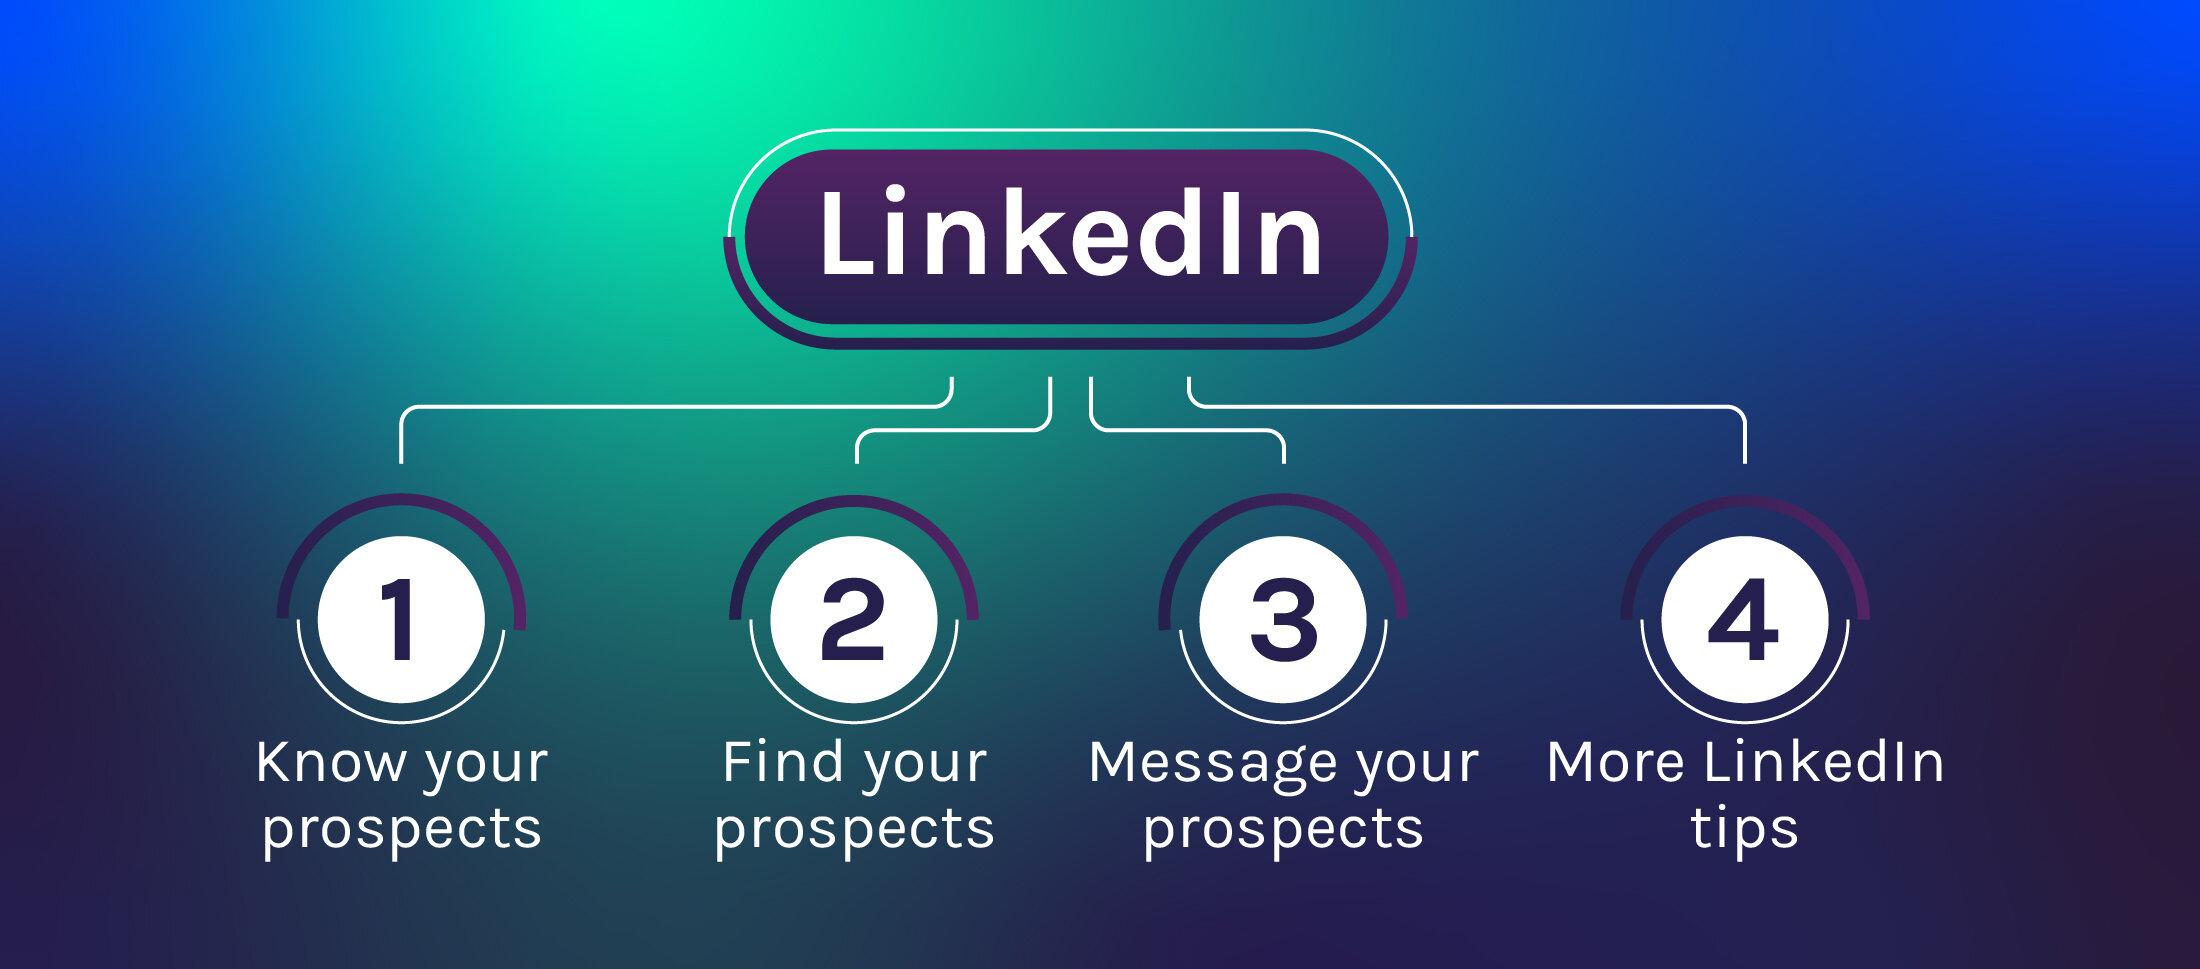 Outbound+prospecting+LinkedIn+banner-1